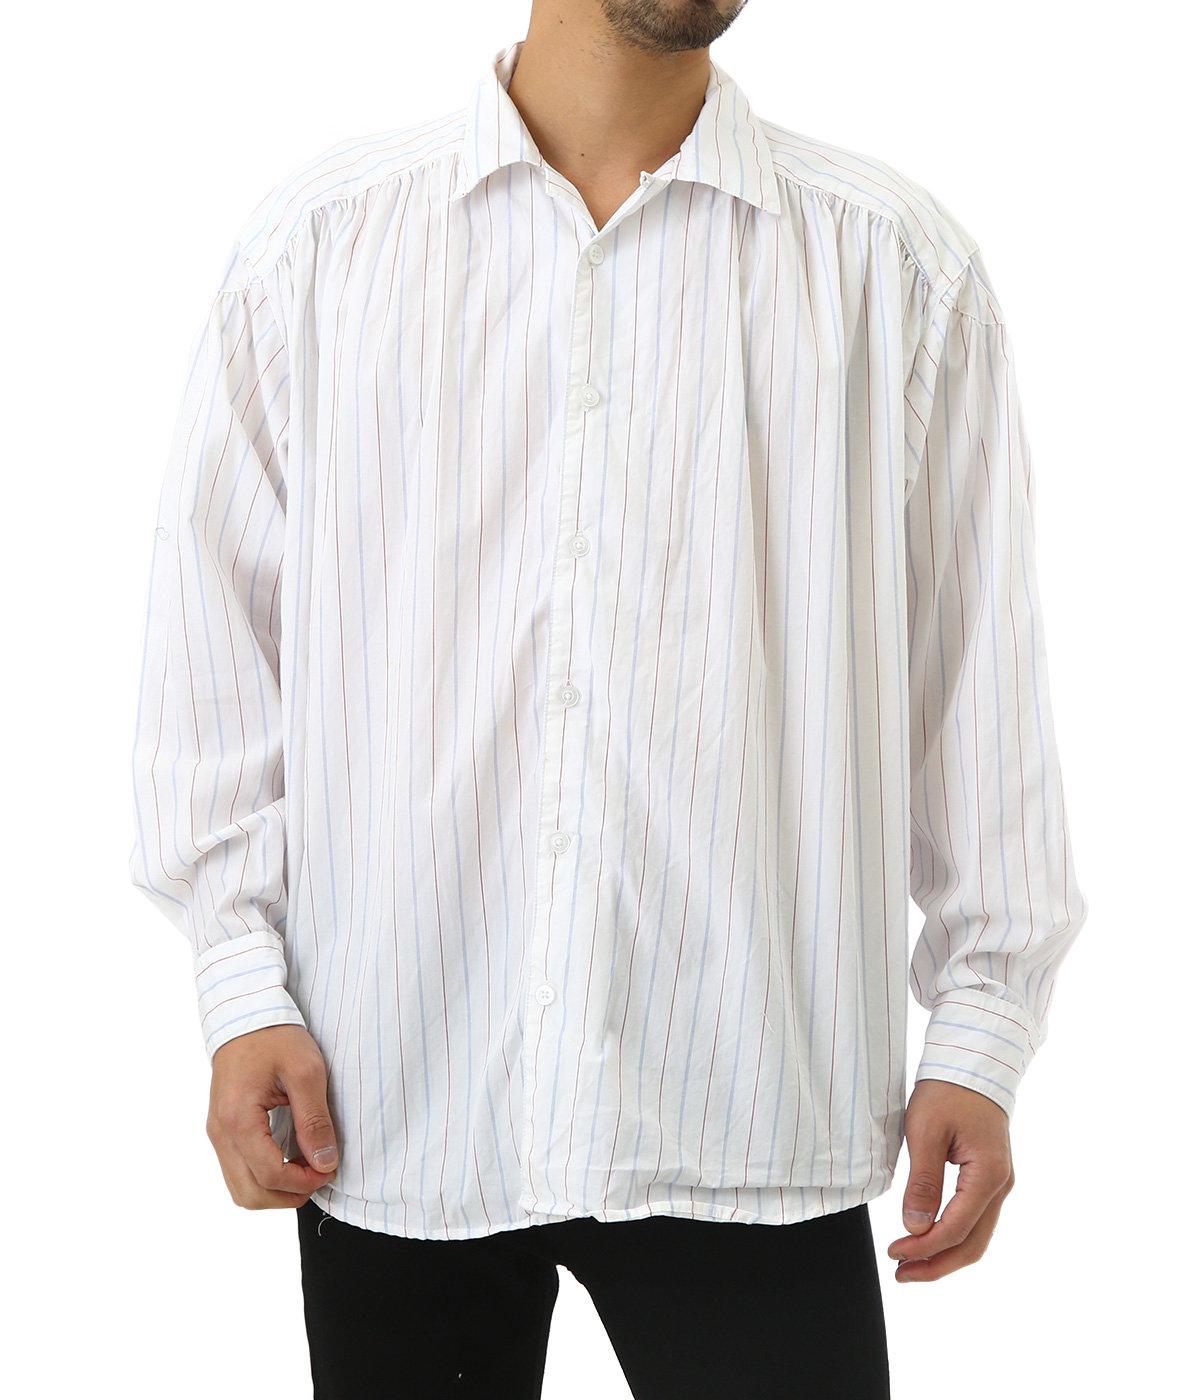 Painter Shirt - Regent St.